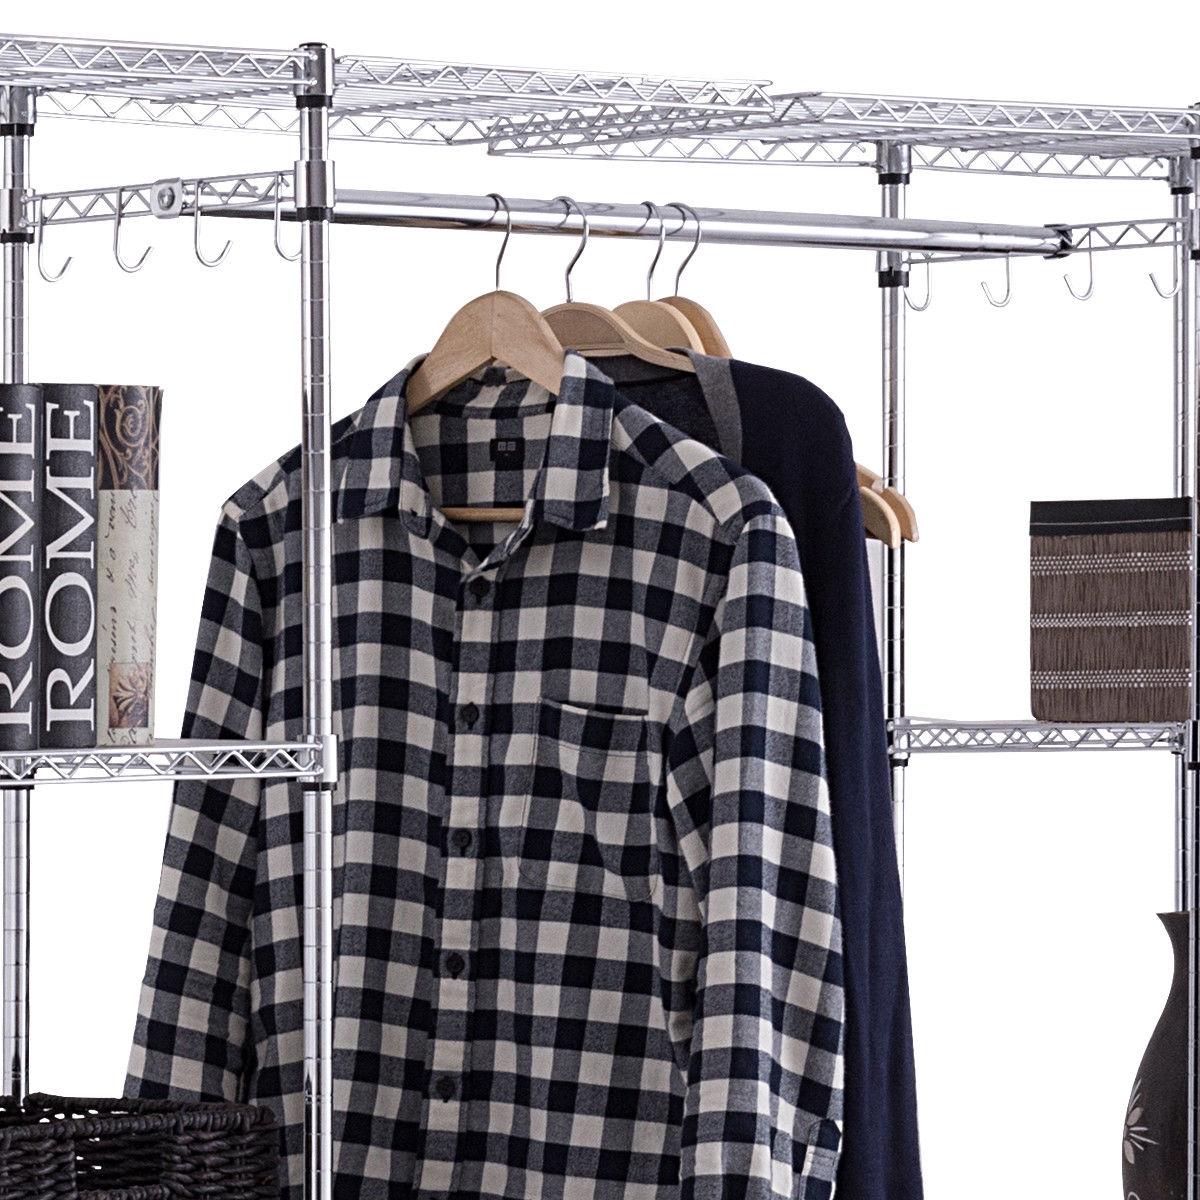 Expandable Free Standing Closet Clothes Hanger Rack